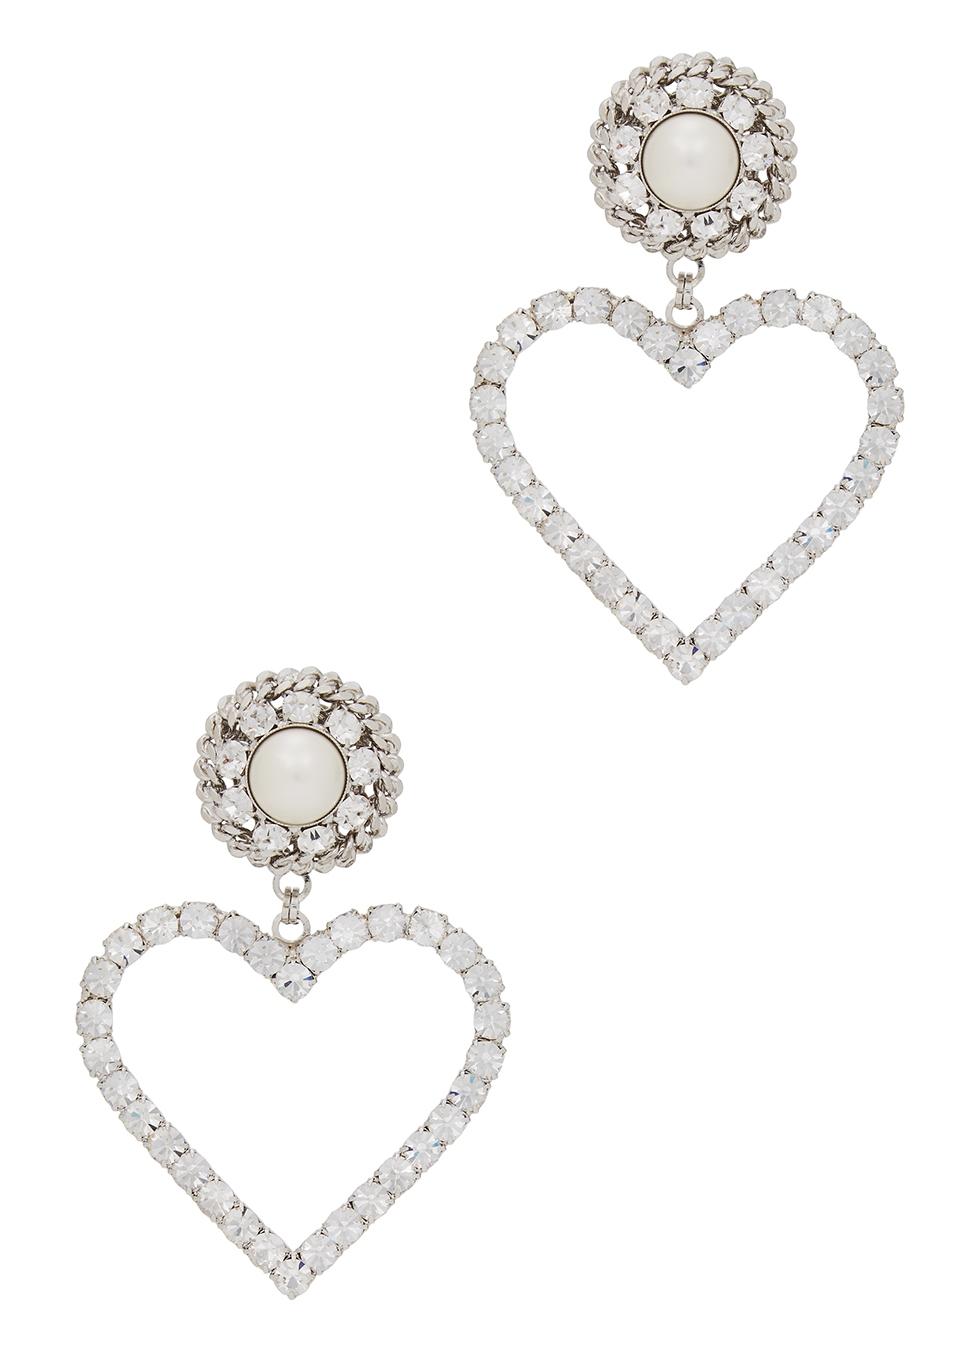 Crystal-embellished heart clip-on earrings